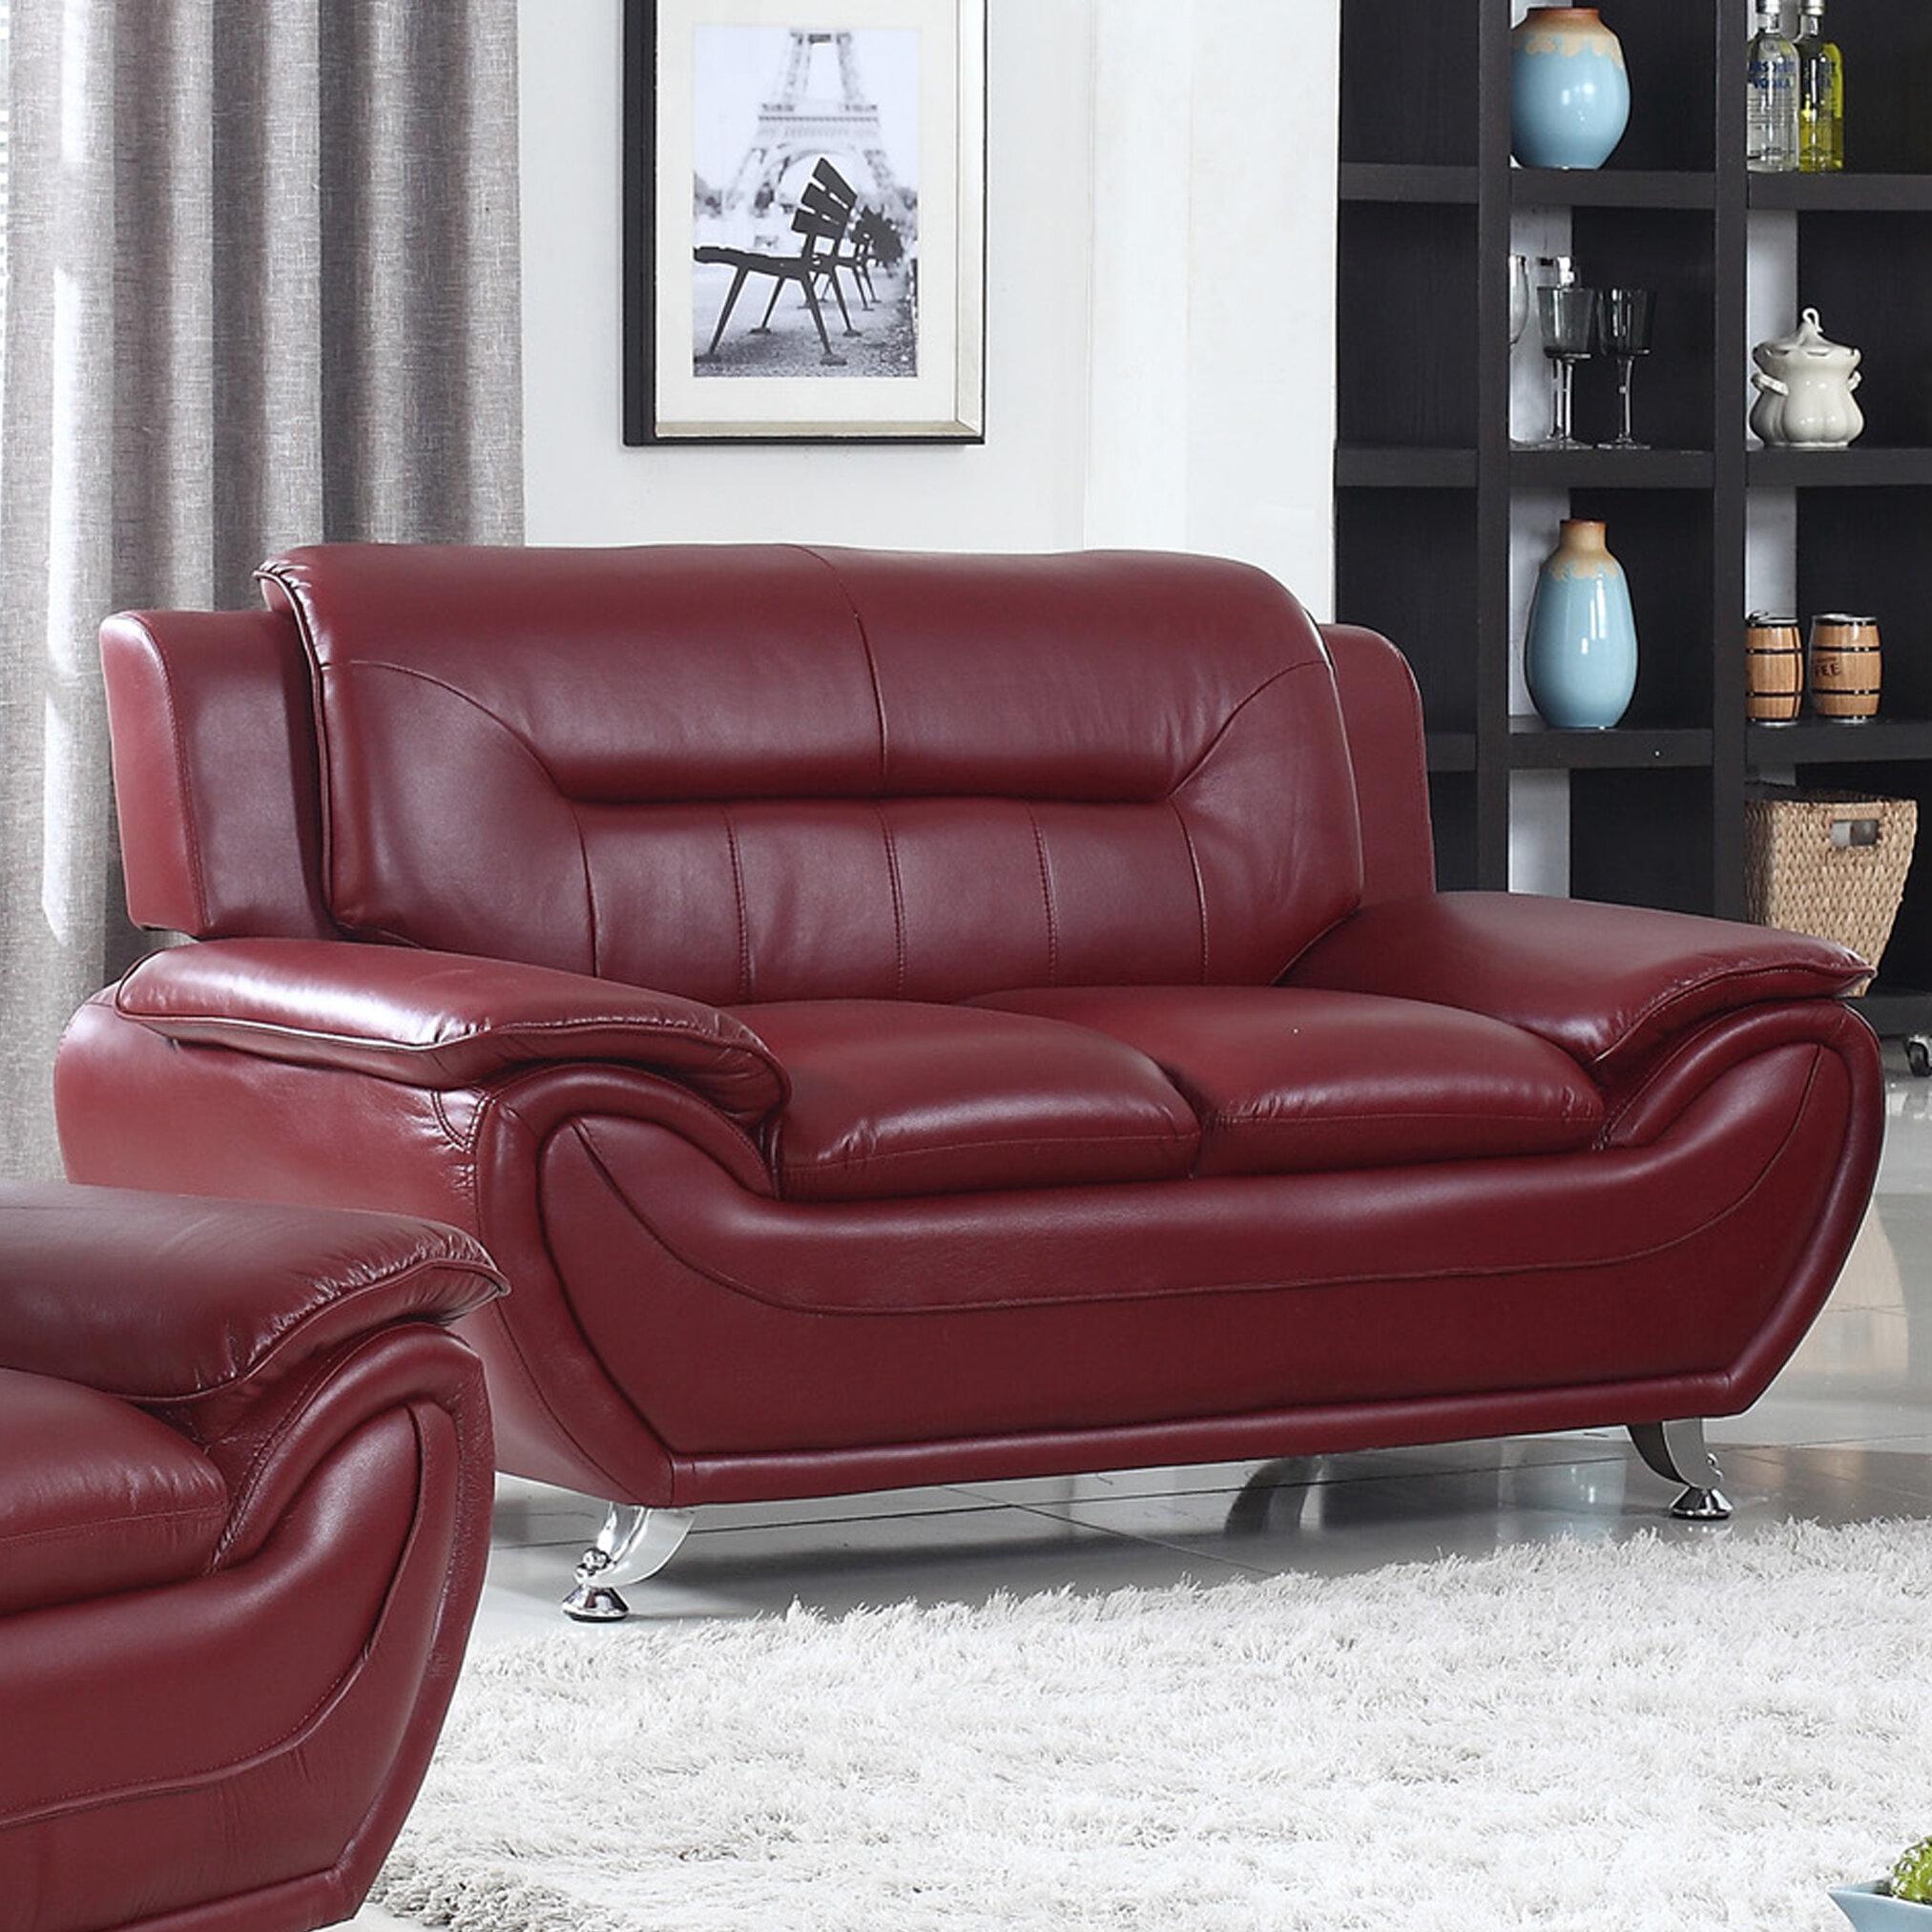 Ebern Designs Brose 62 Wide Faux Leather Pillow Top Arm Loveseat Reviews Wayfair